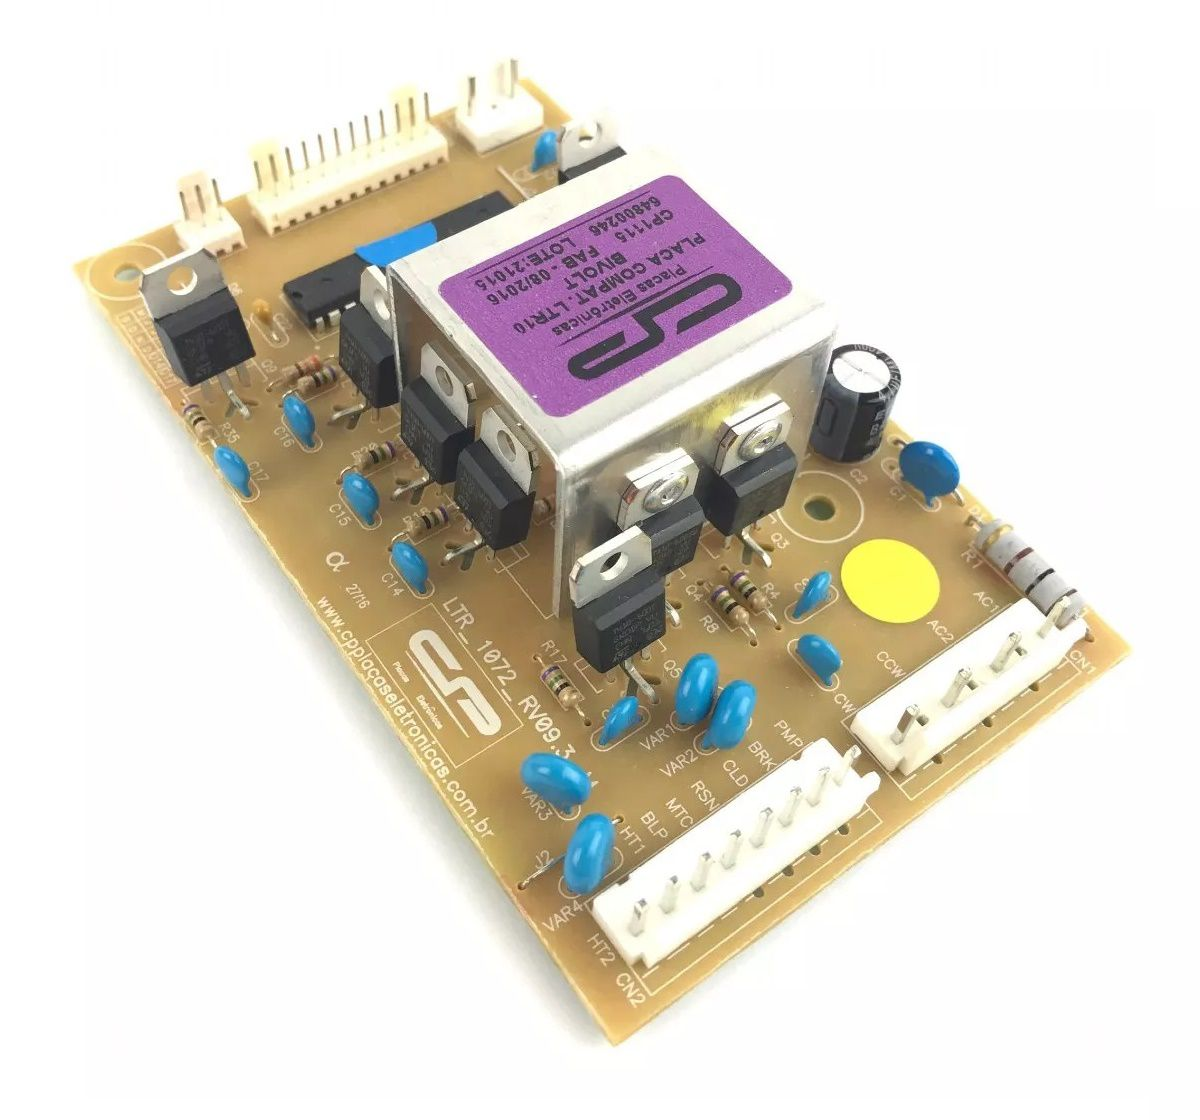 PLACA LAVADORA ELECTROLUX - LTR10-COMPATIVEL 64800246